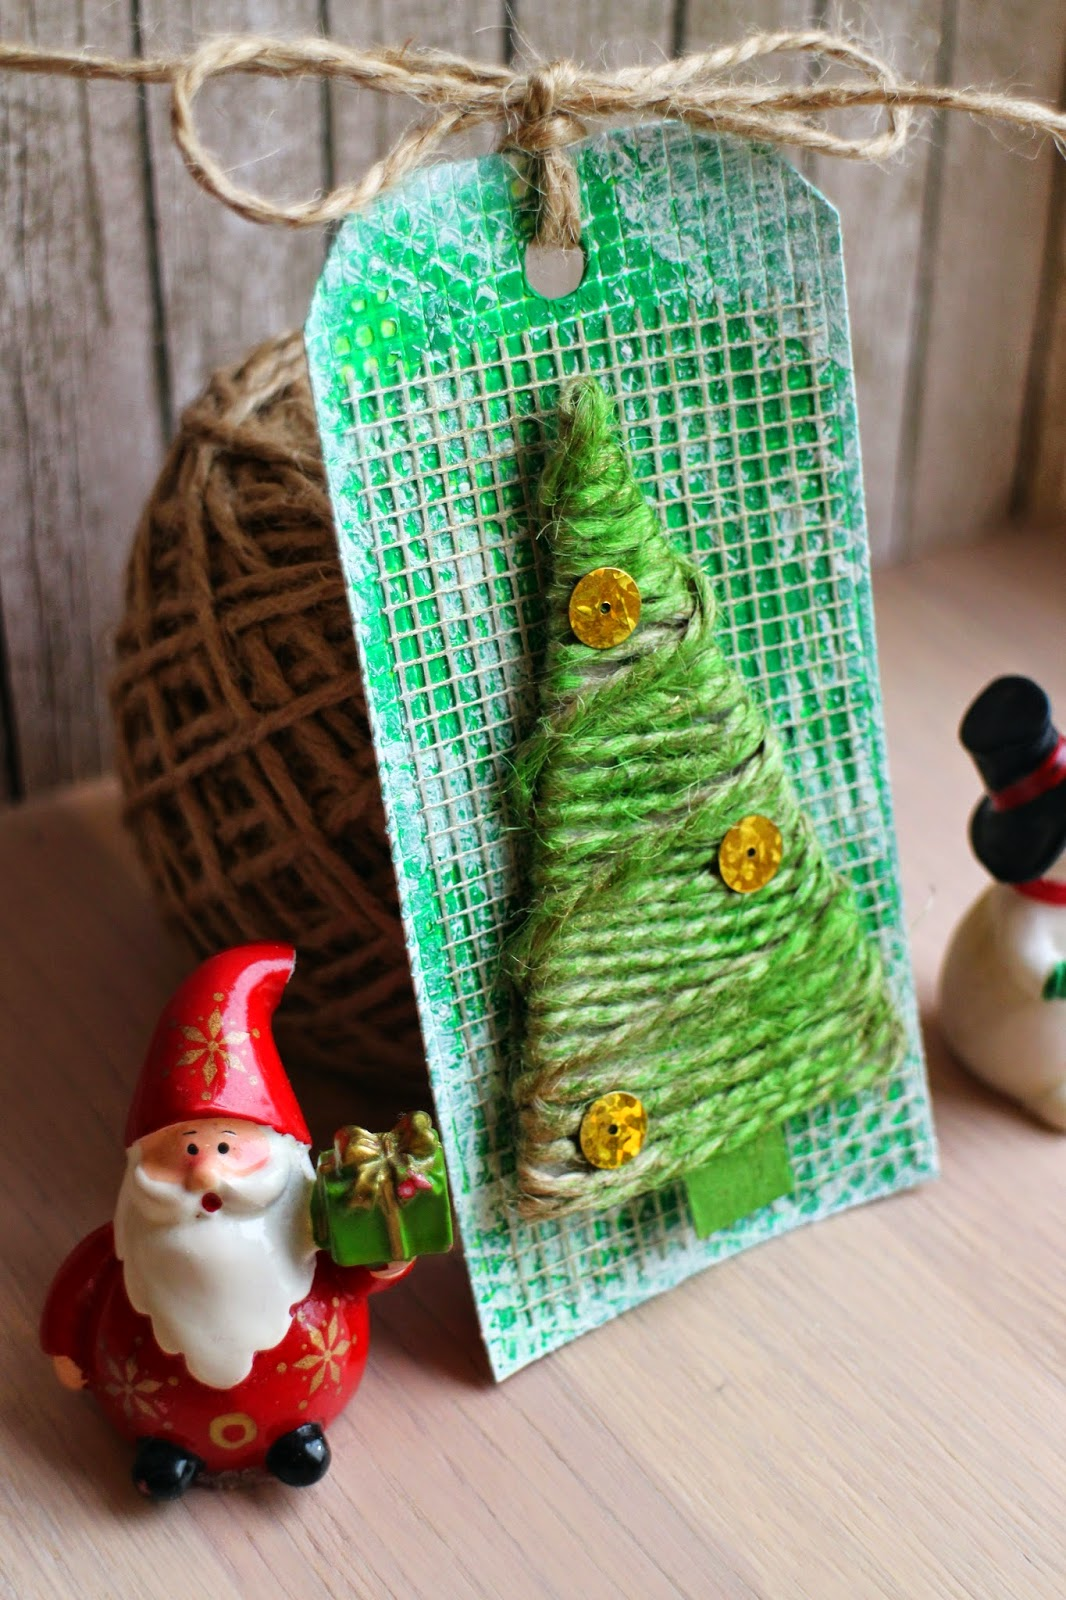 tag New Year tree scrapbooking скрапбукинг тег ёлка зелёный золото hamster-sensey